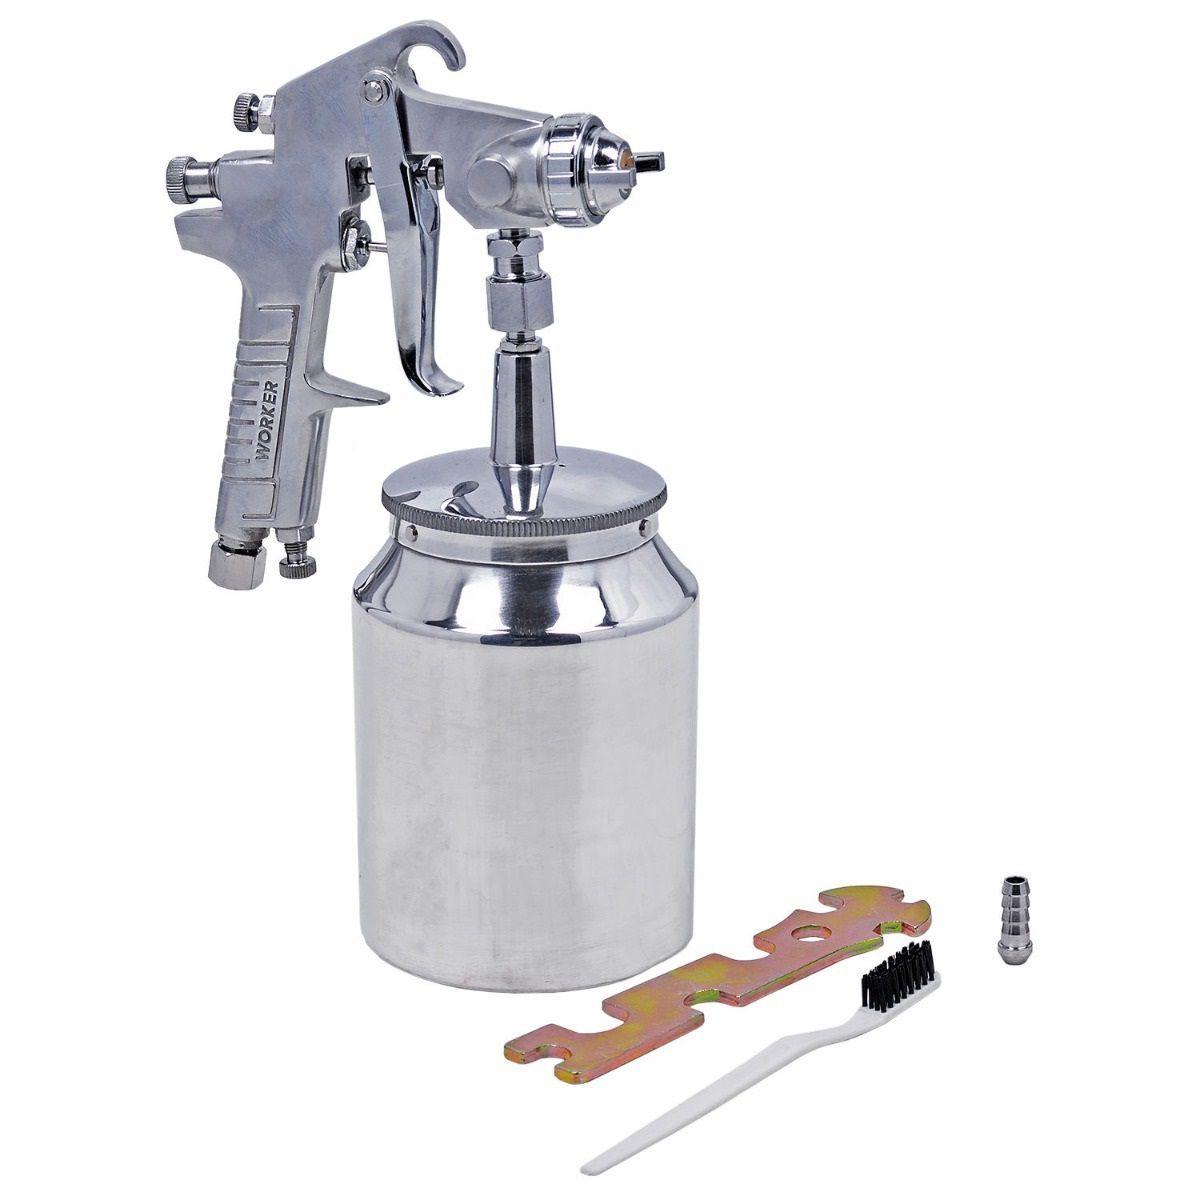 Aplicador de Pintura Mod 104299 Caneca Alumínio Worker